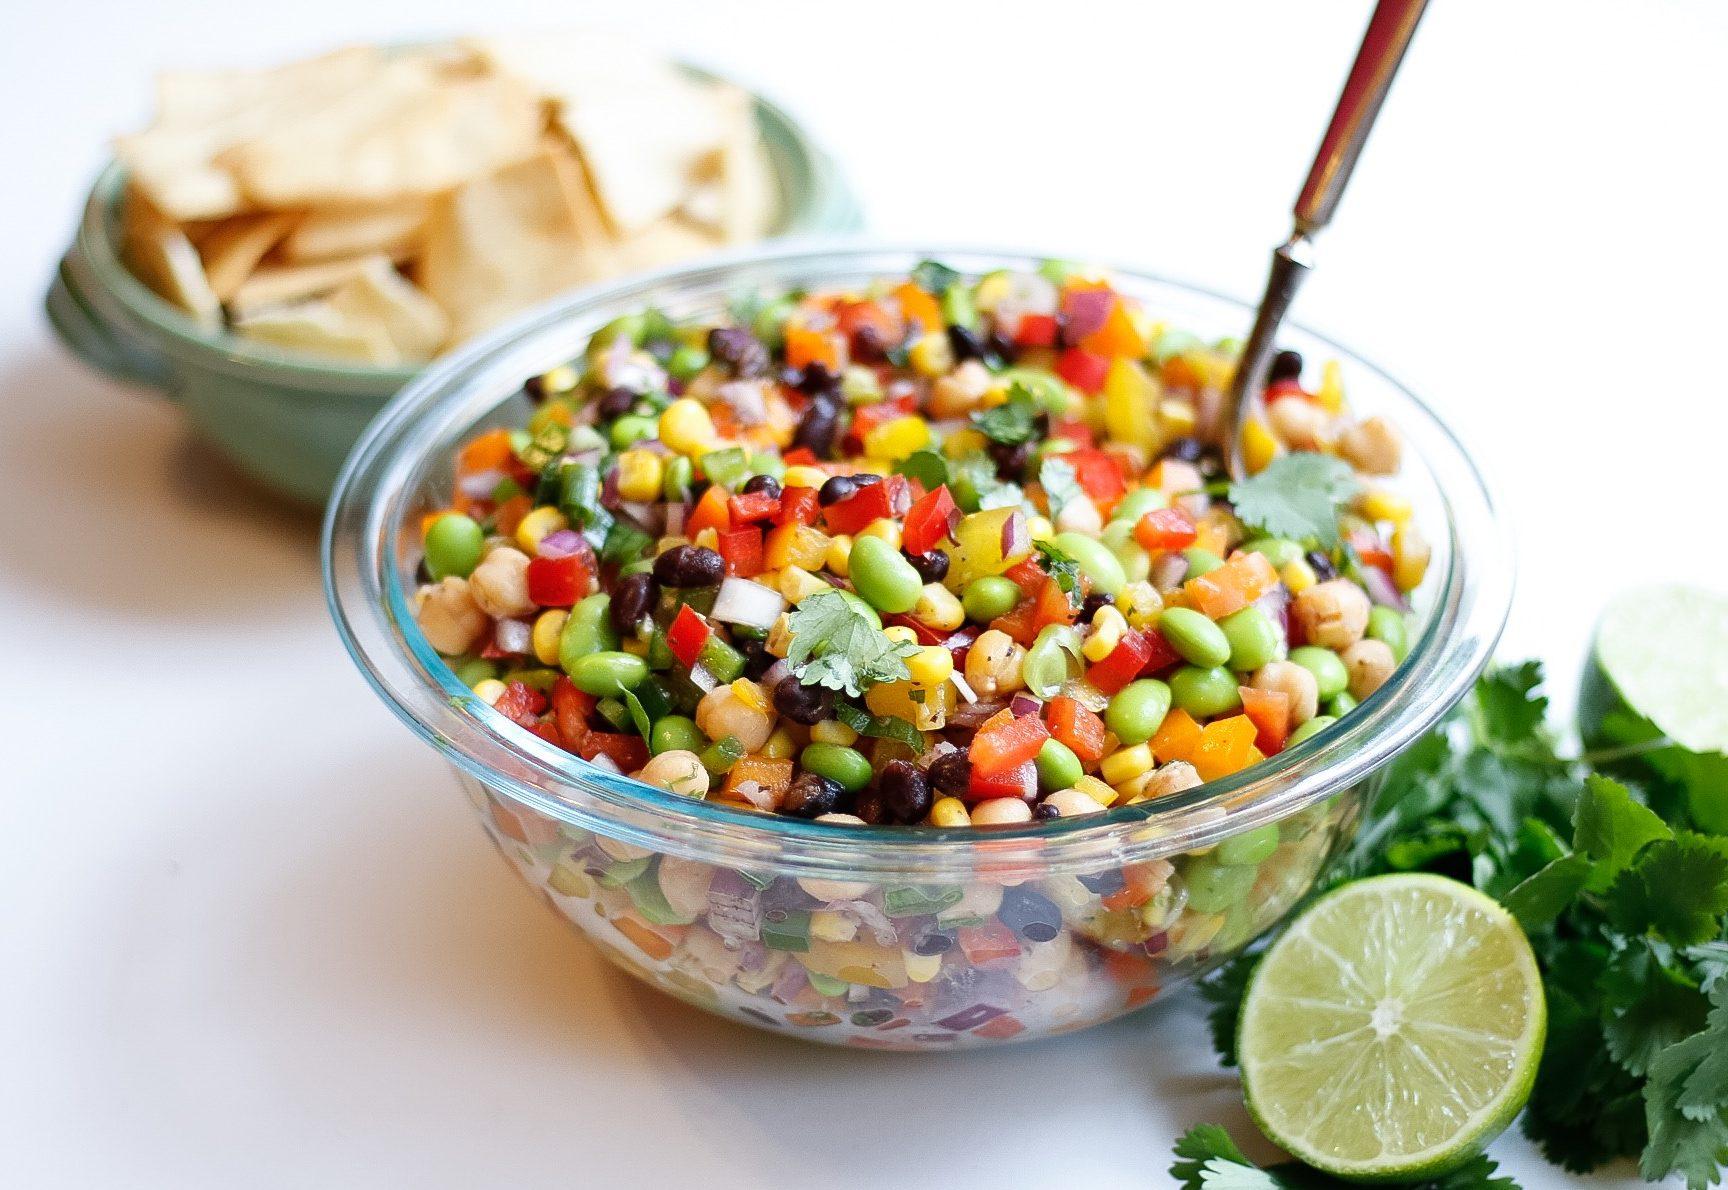 edamame caviar, cowboy caviar, edamame, bell peppers, superbowl appetizer, appetizer